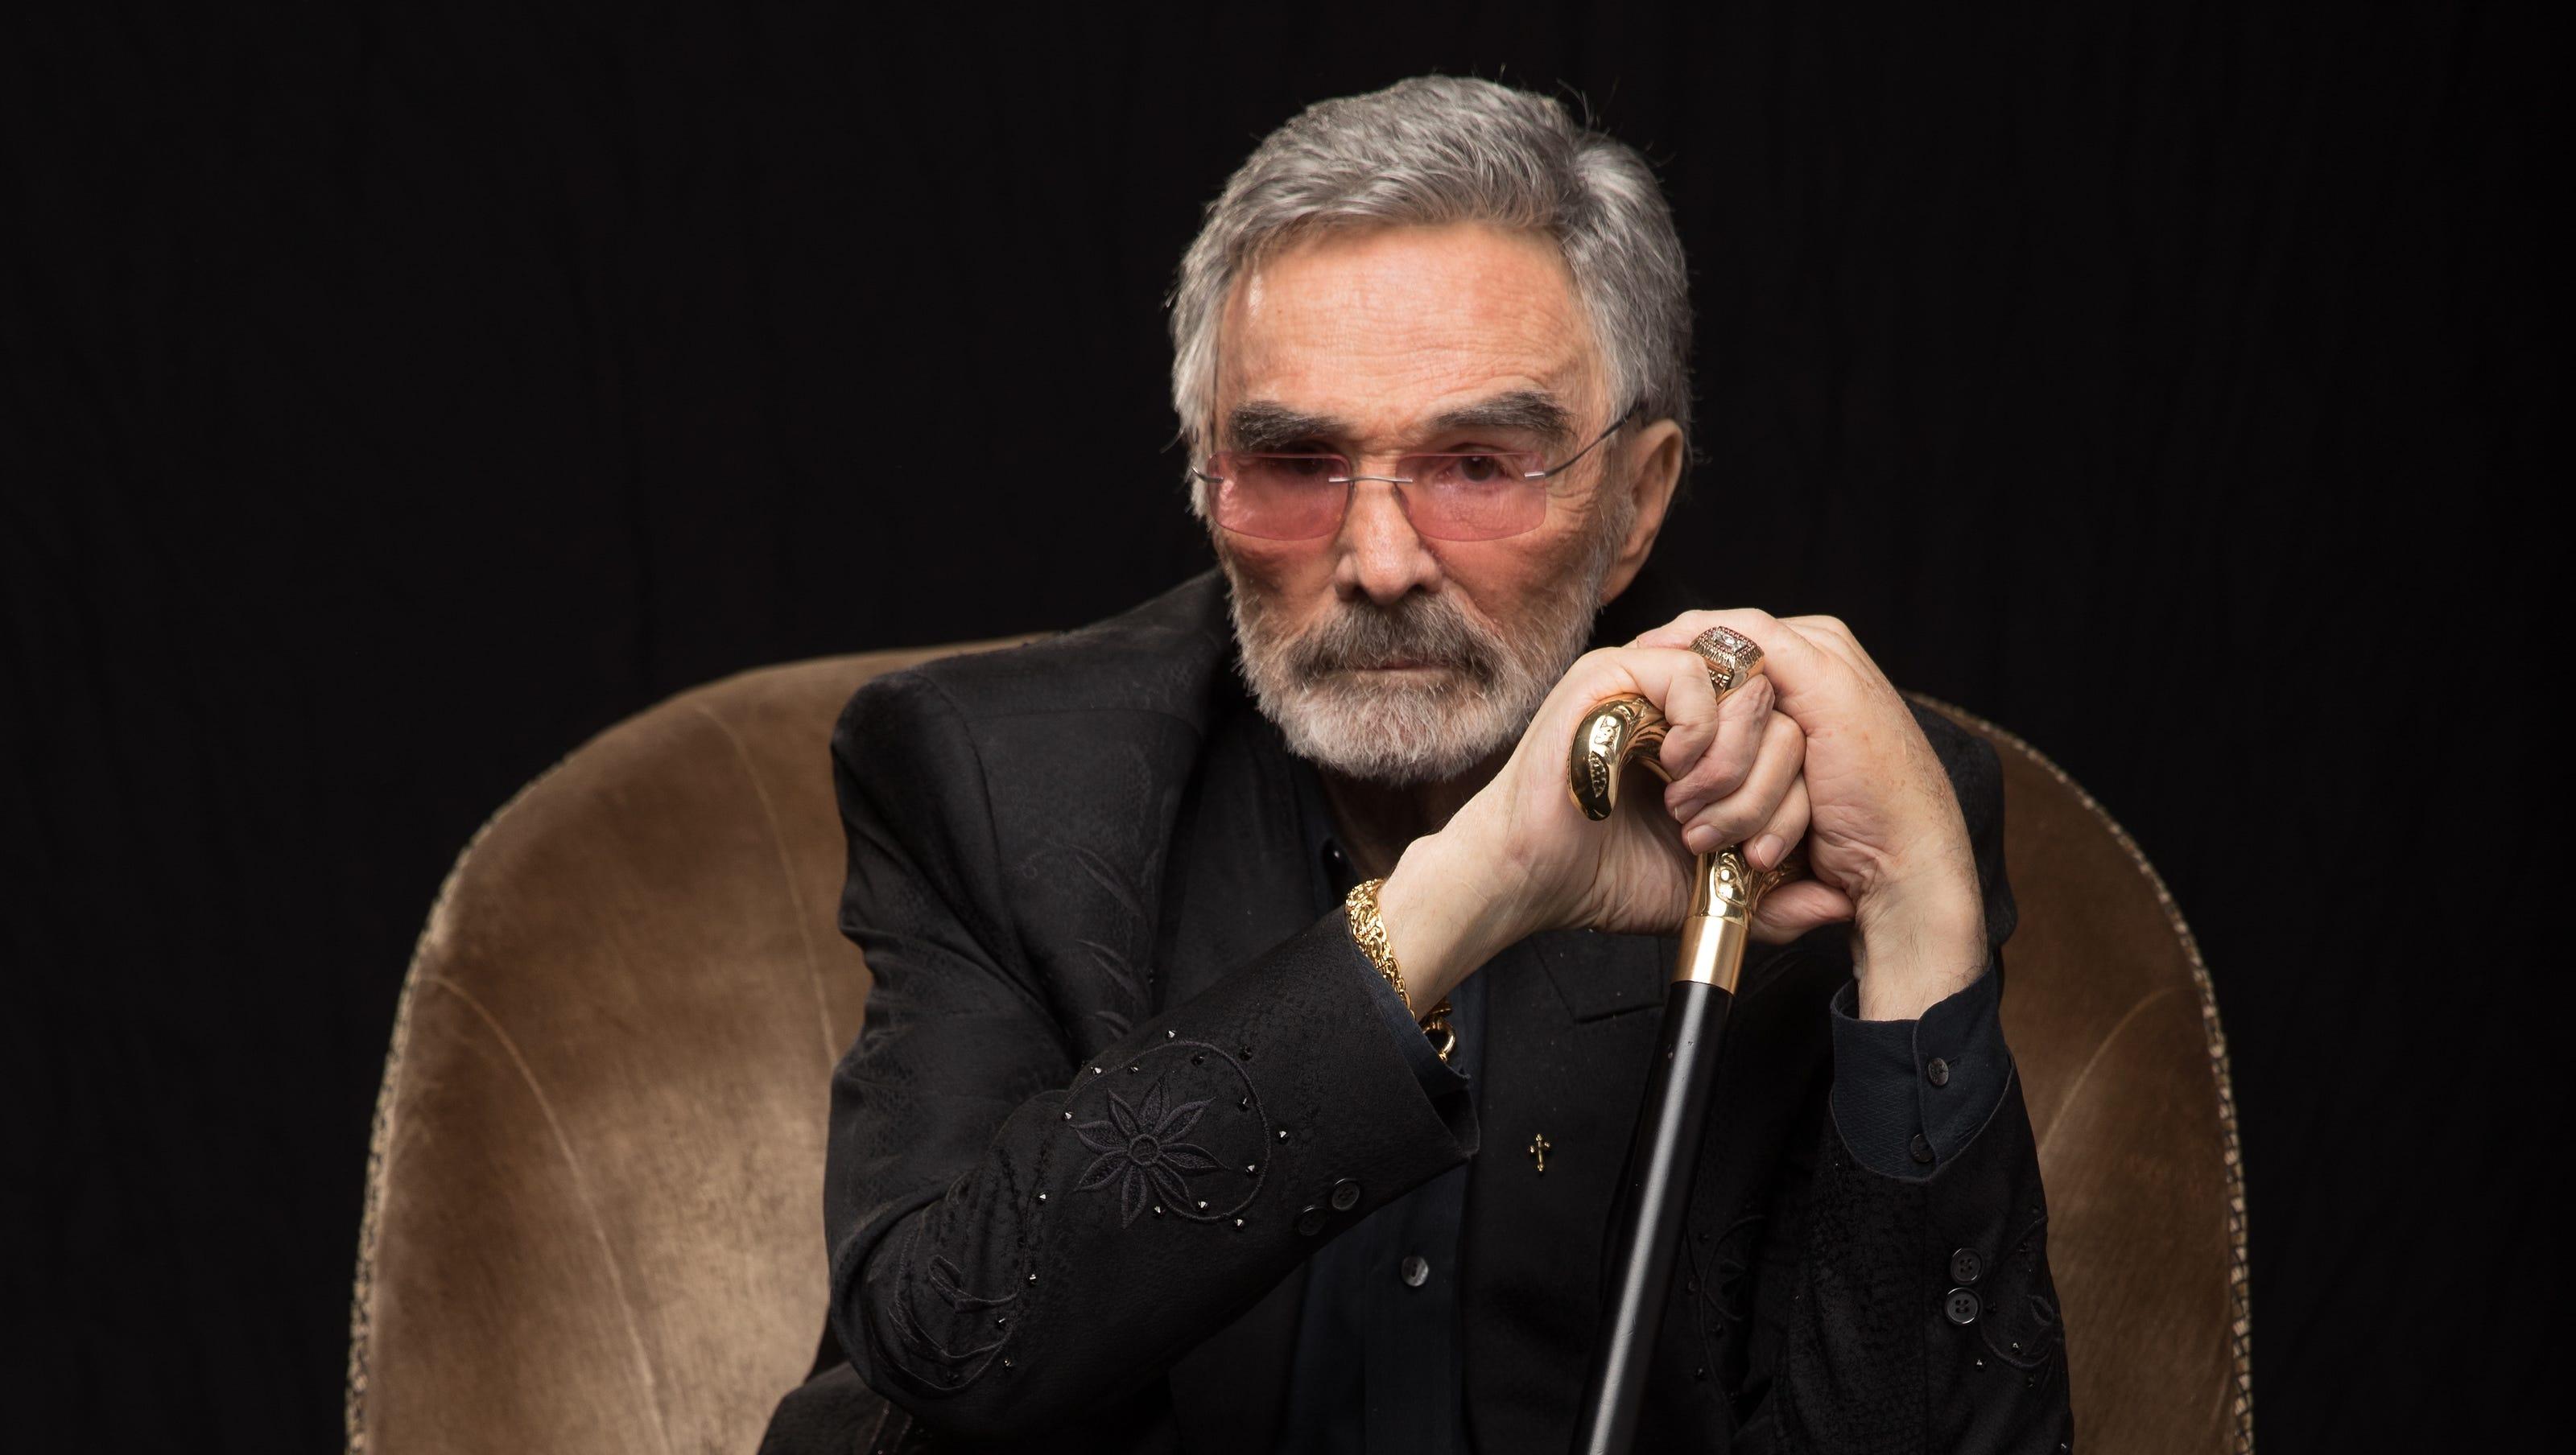 Burt Reynolds: Facebook mistakenly